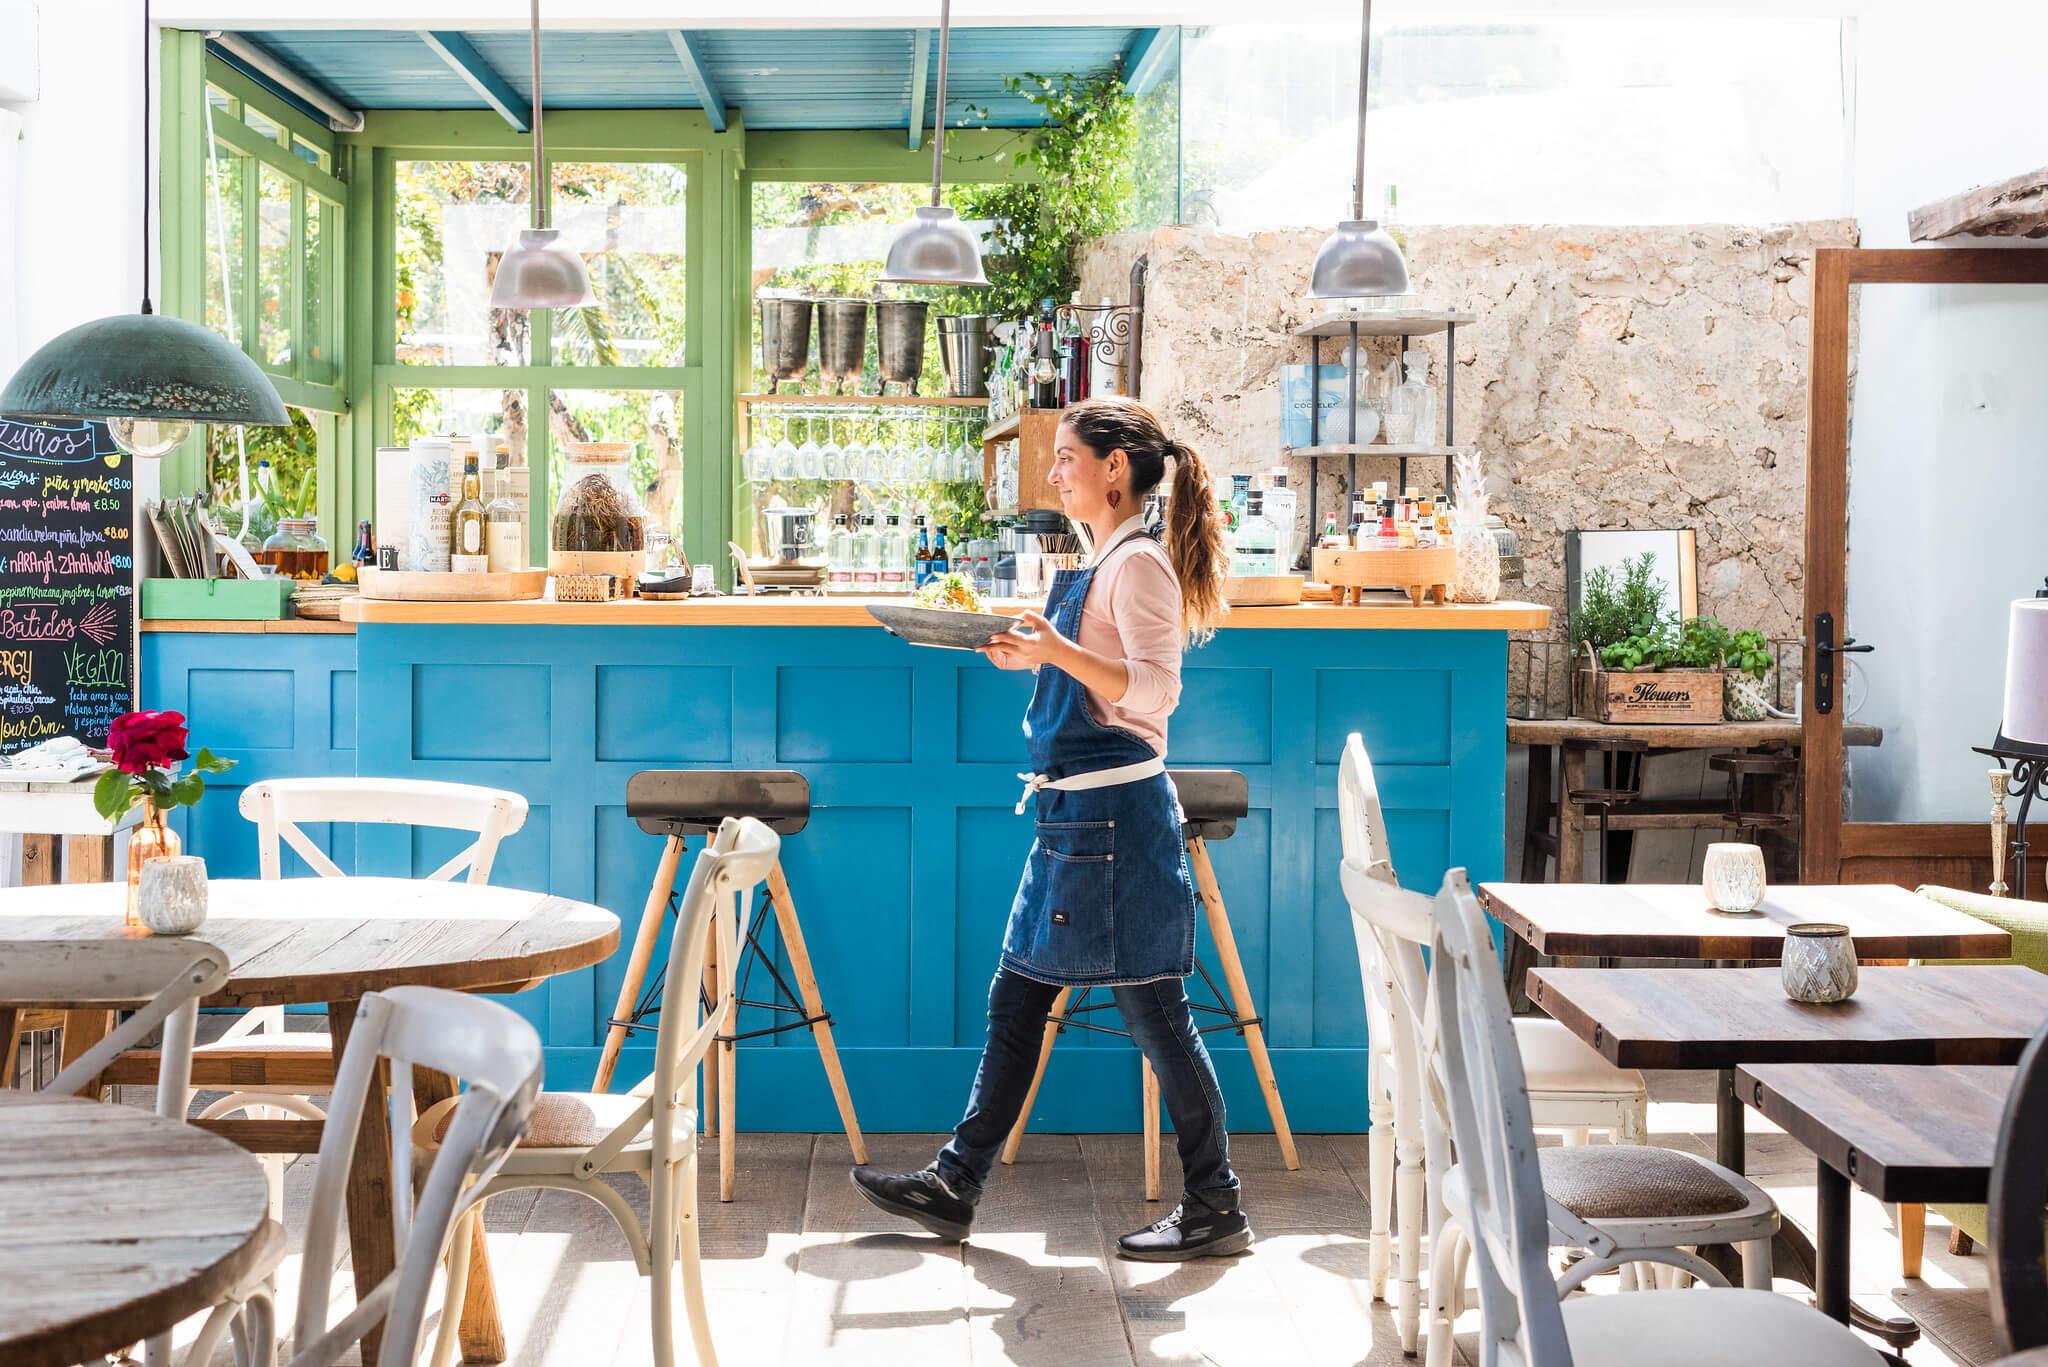 https://www.white-ibiza.com/wp-content/uploads/2020/03/white-ibiza-restaurants-es-cucons-13.jpg